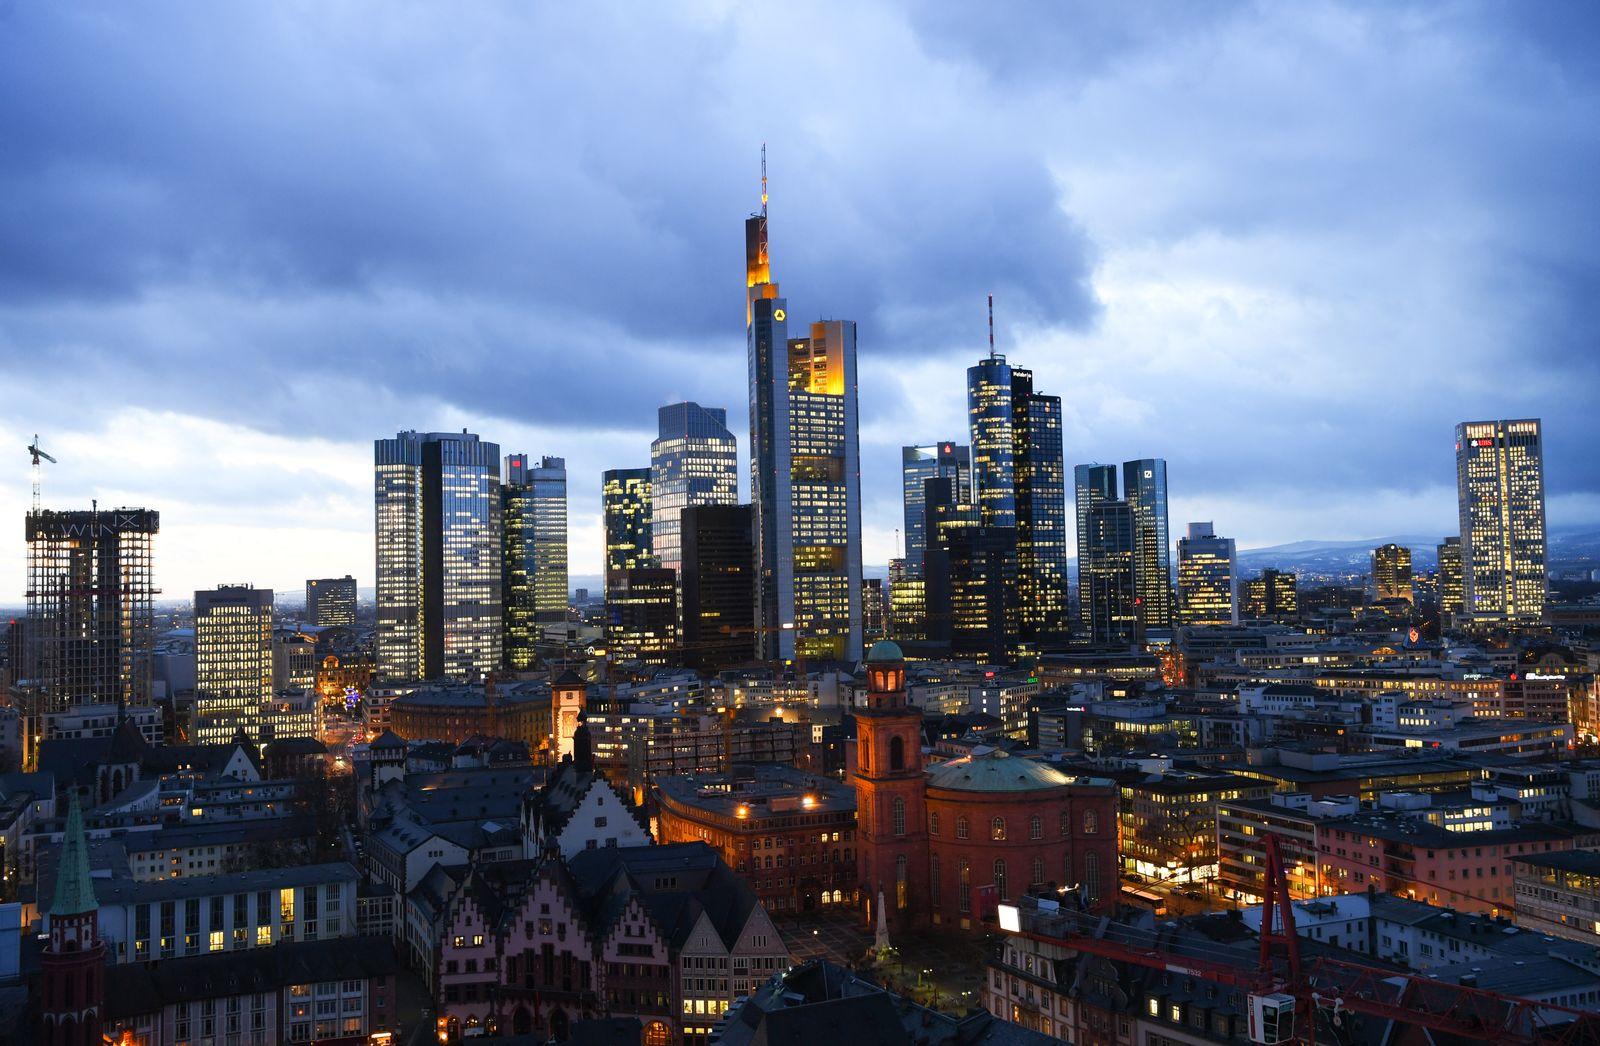 Frankfurt Skyline / Banken / Banken-Viertel